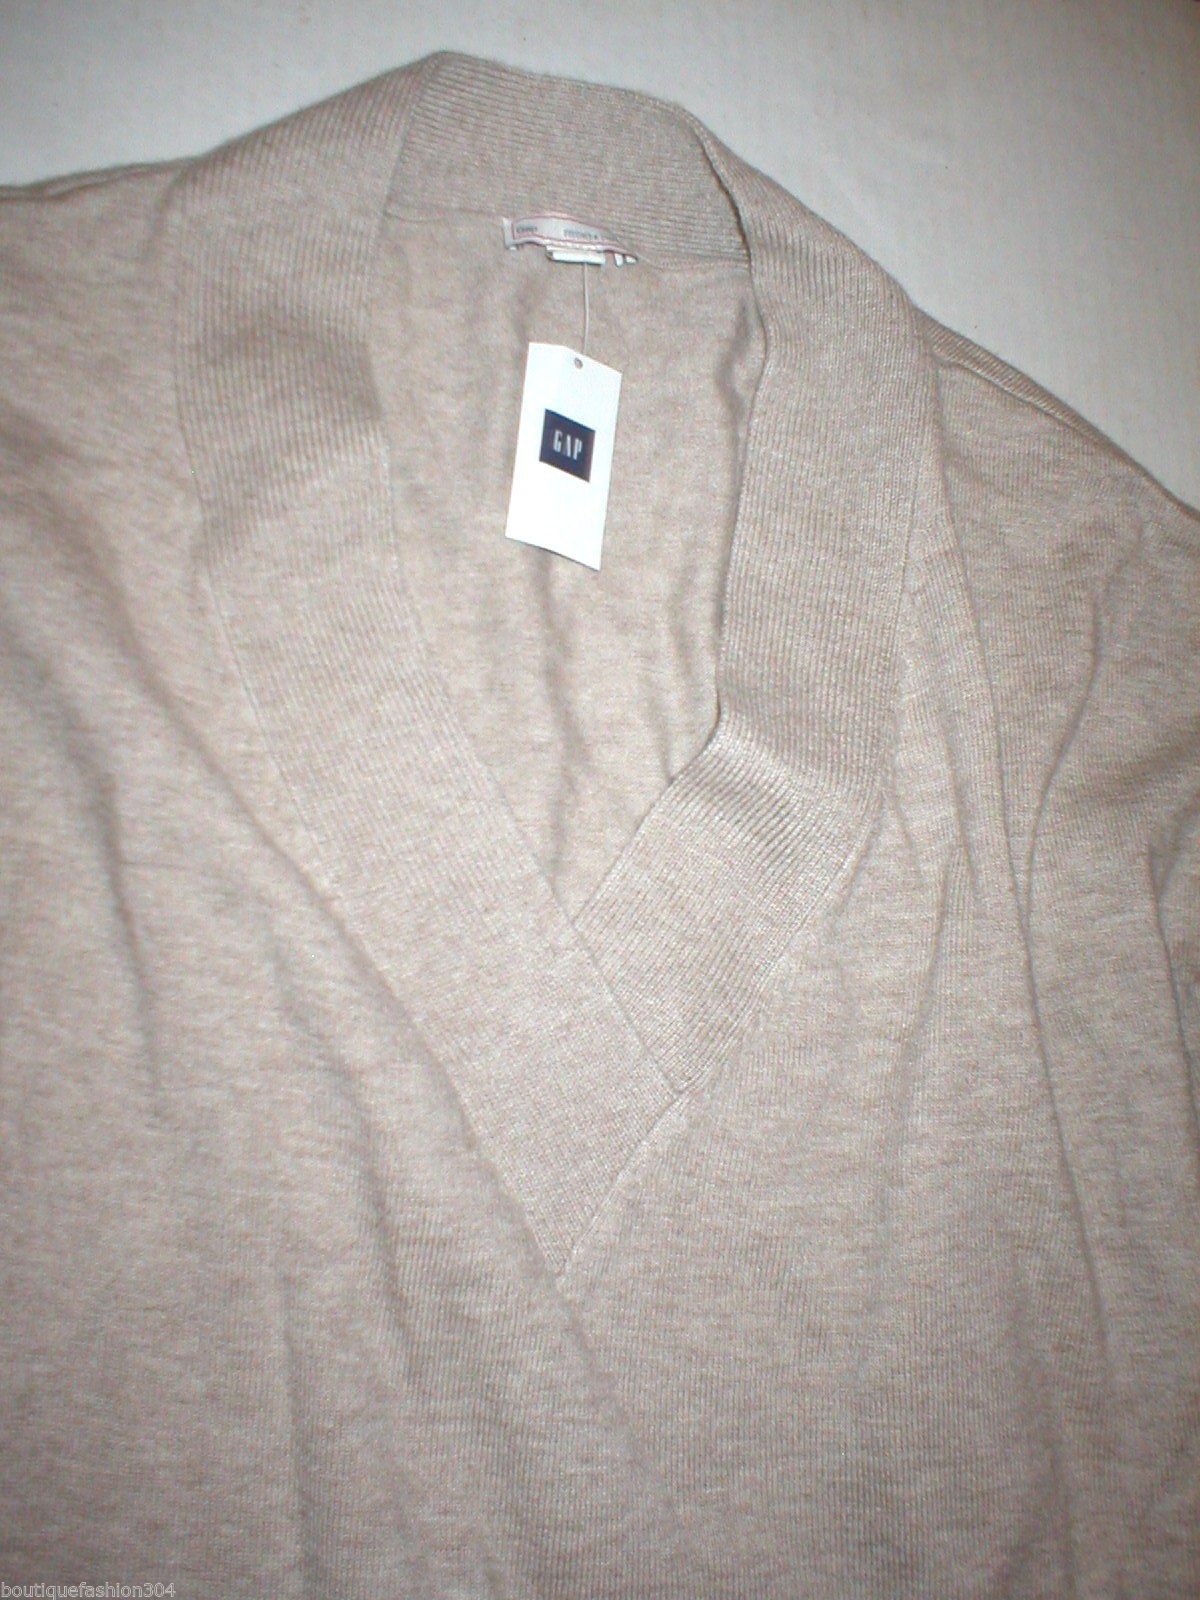 NWT New Womens Gap Sweater Extra Soft Merino Extra Fine Wool S Khaki Beige Tan